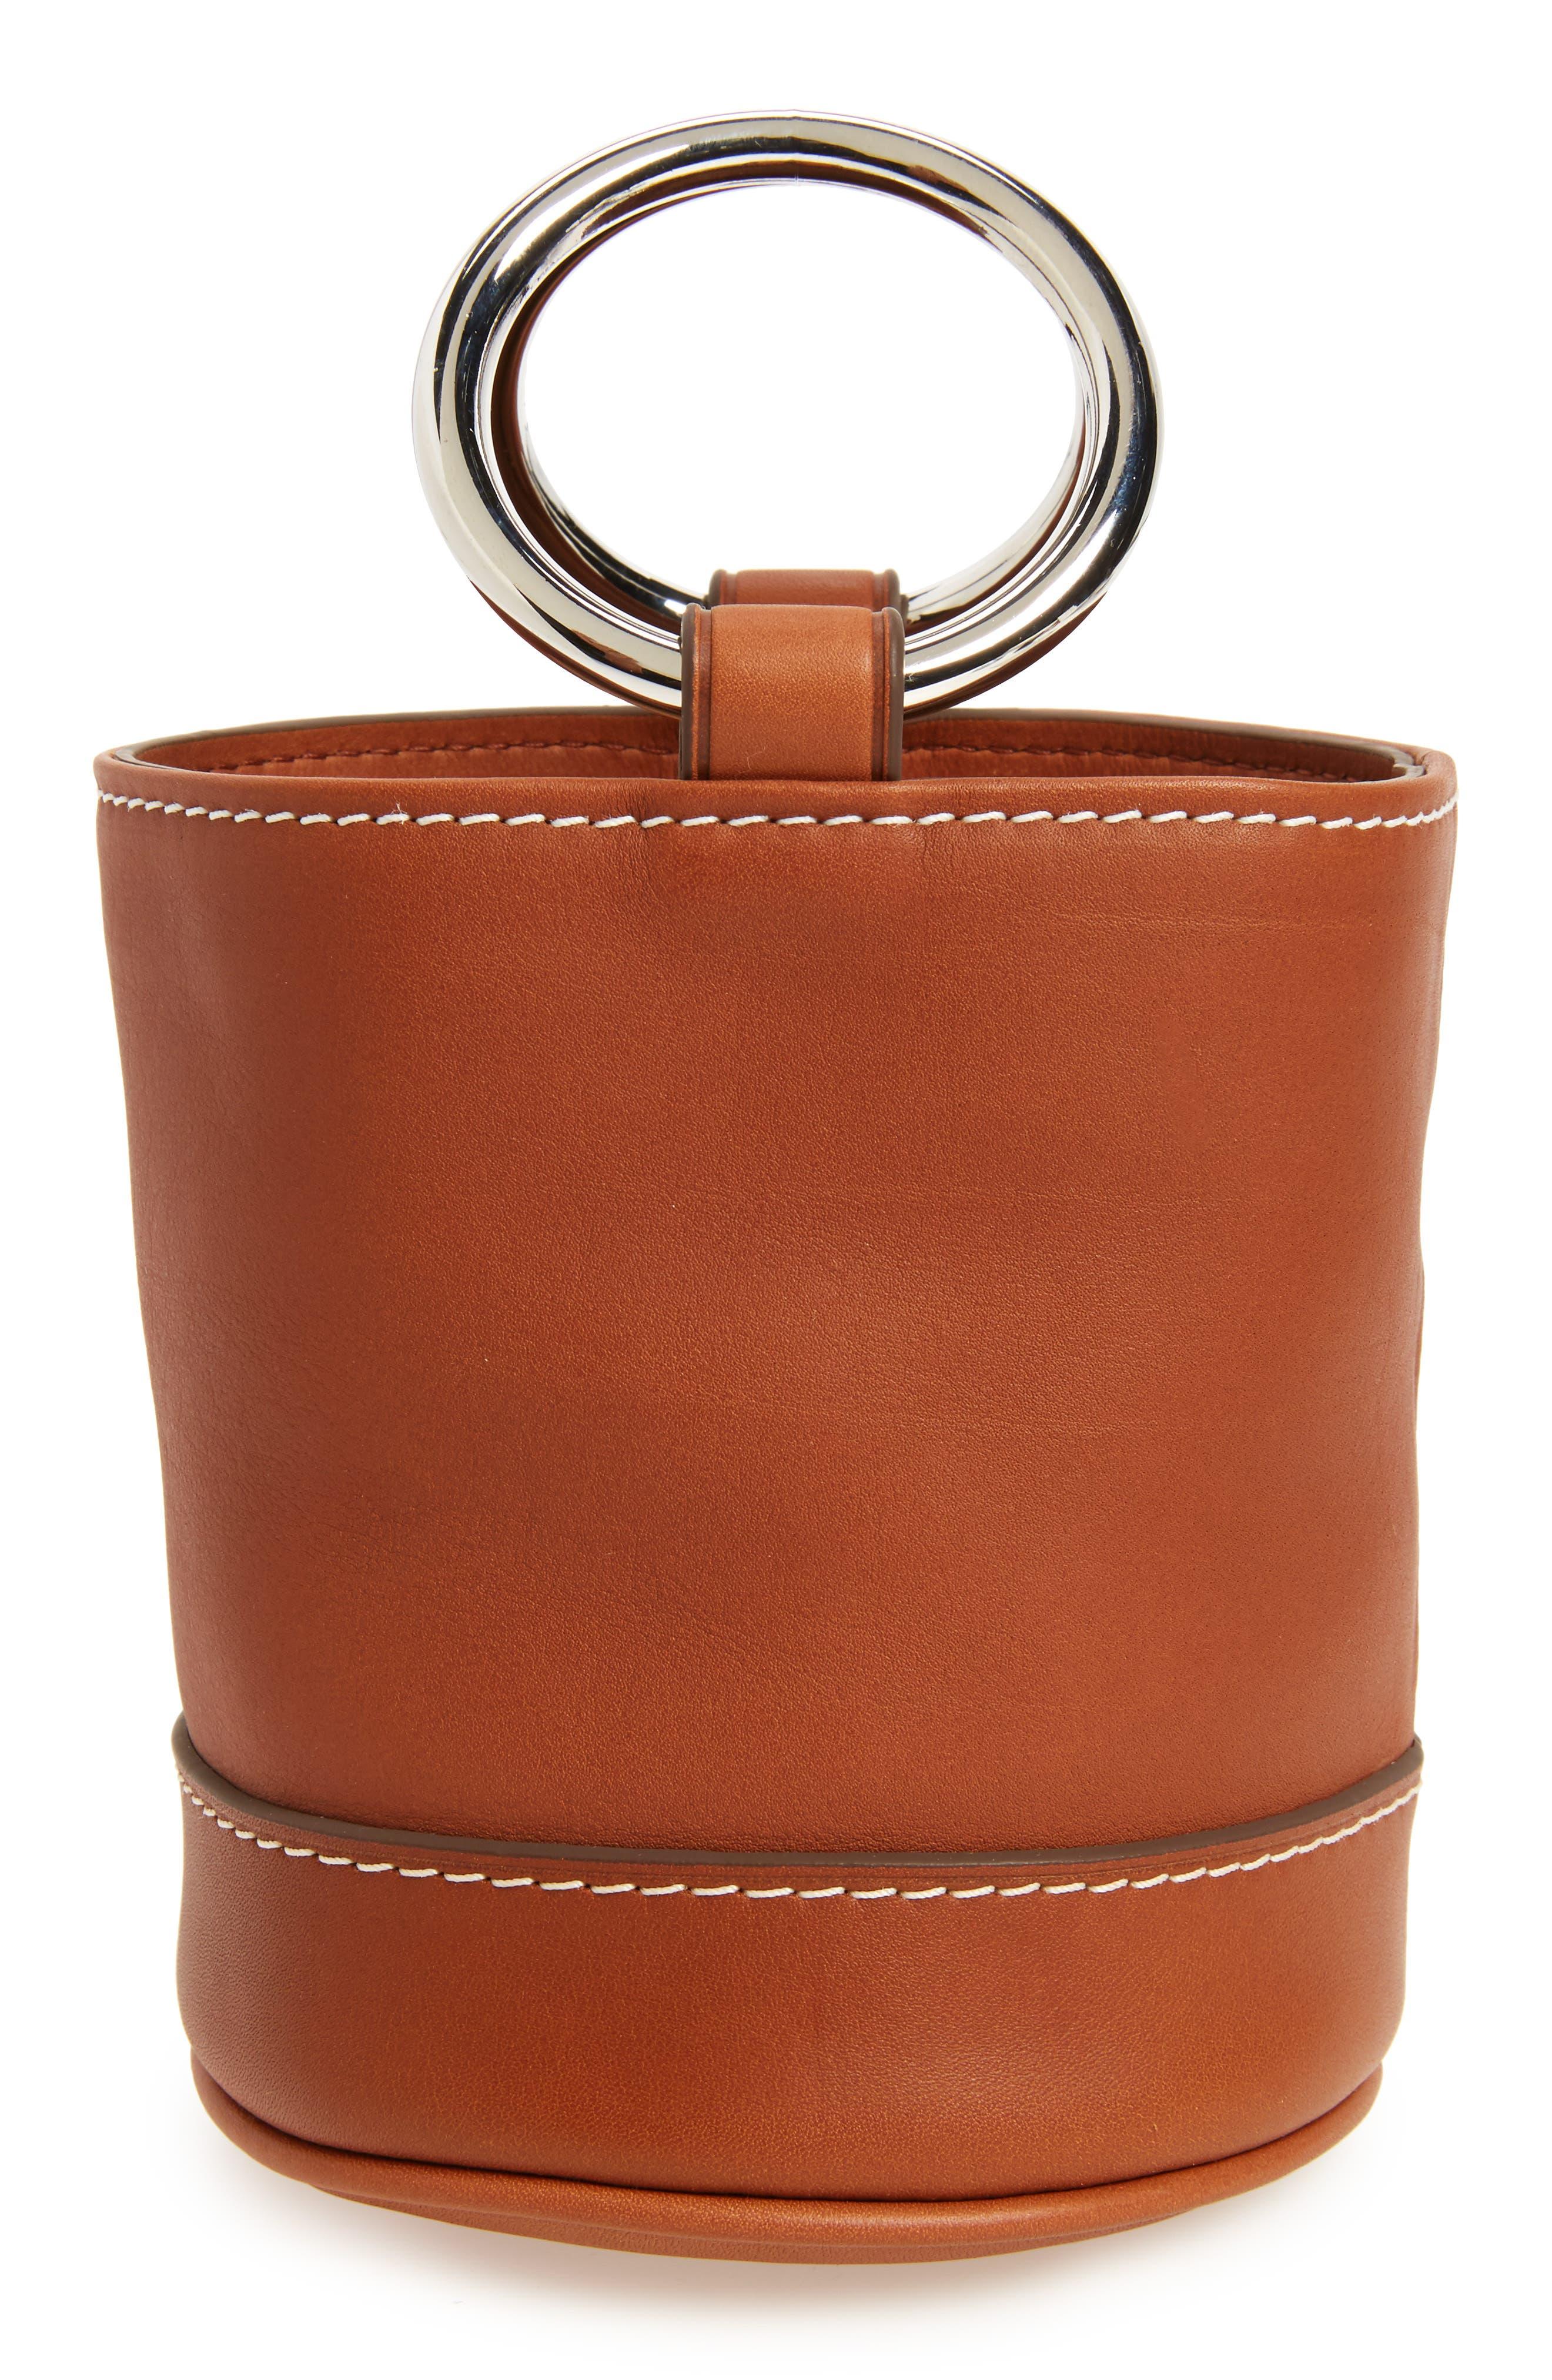 Main Image - Simon Miller Bonsai Calfskin Leather Bucket Bag